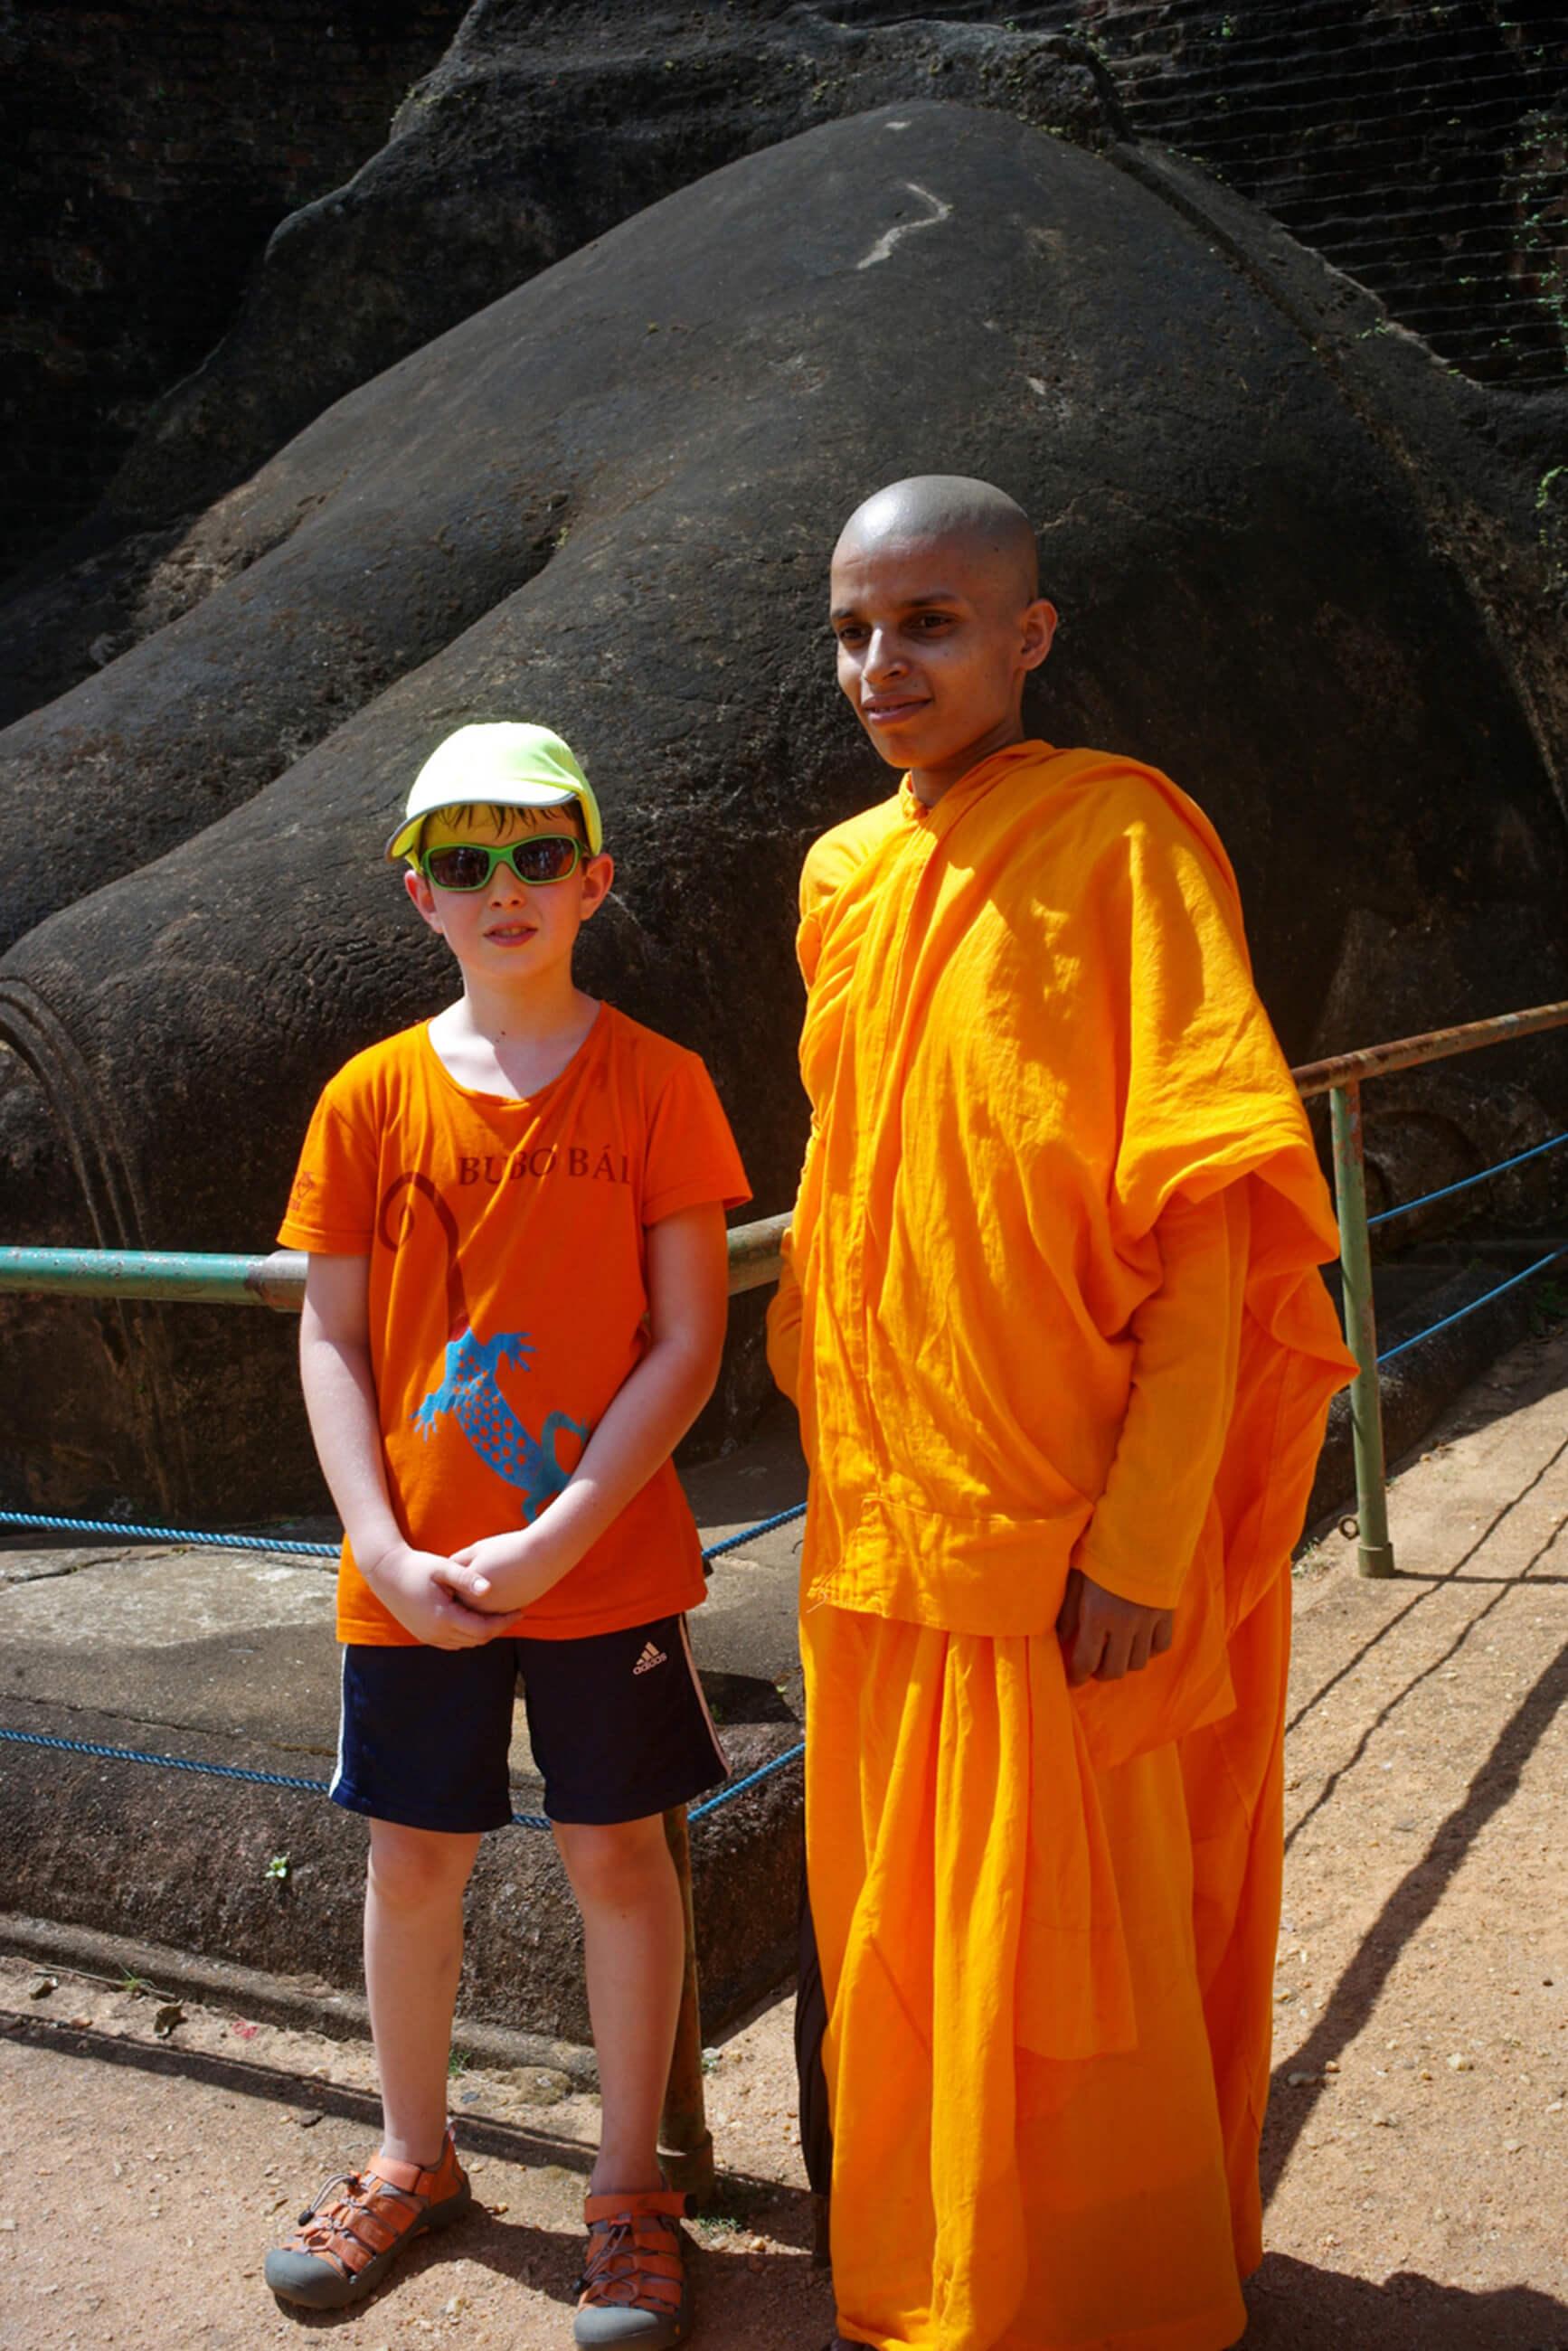 https://bubo.sk/uploads/galleries/7521/srilanka_family_stred-kultur.-matko-s-budhistickym-mnichom.jpg